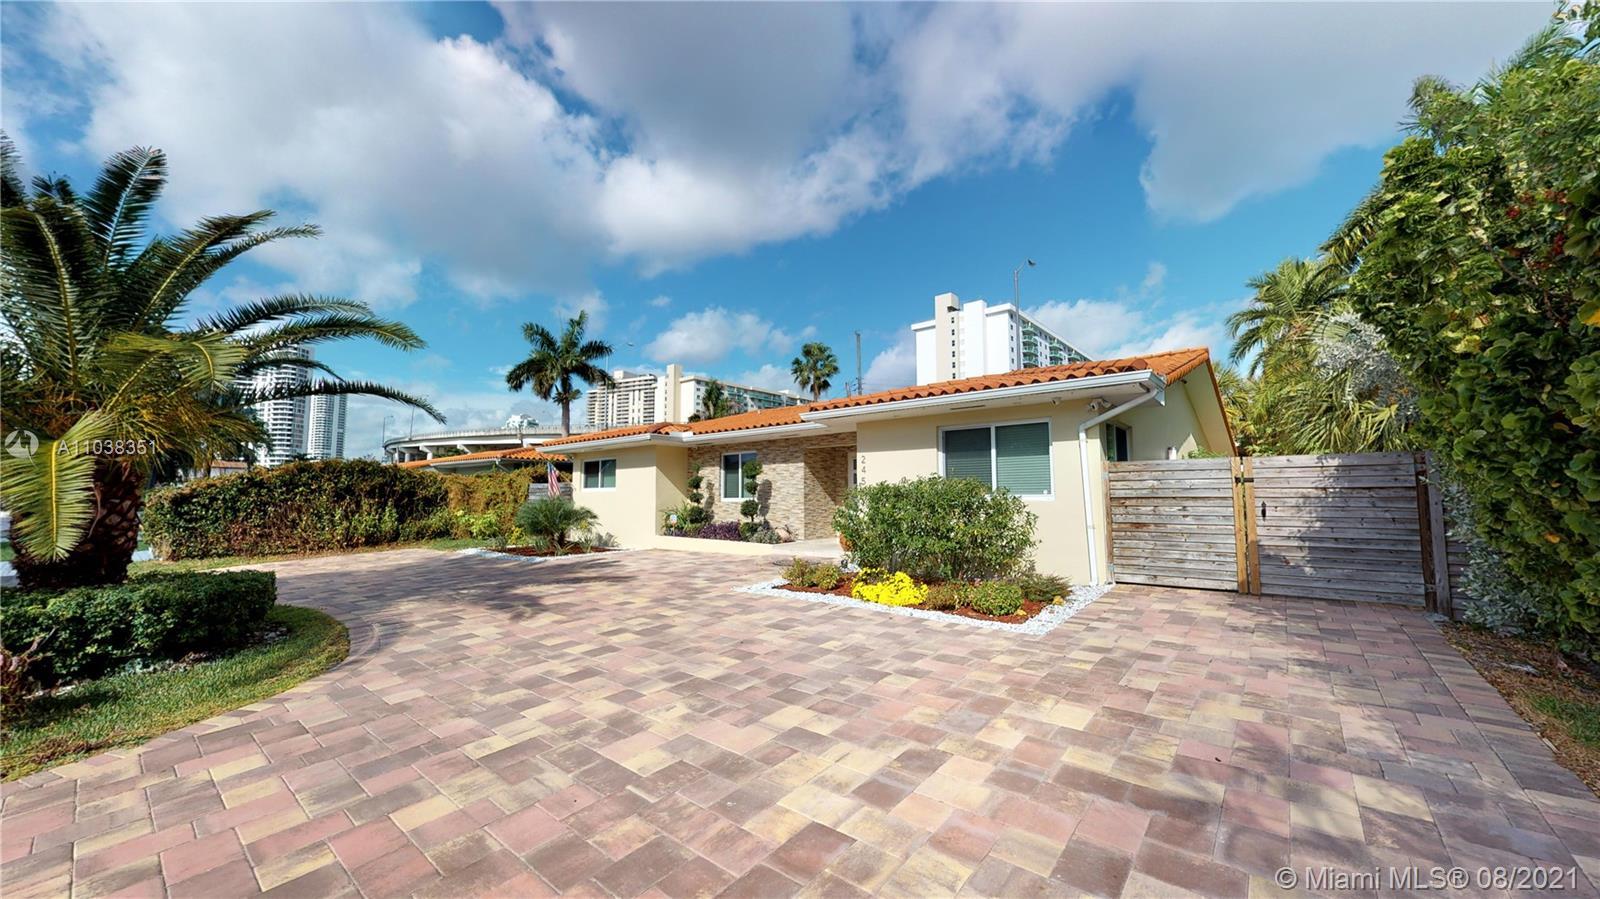 245 191st Ter, Sunny Isles Beach, Florida 33160